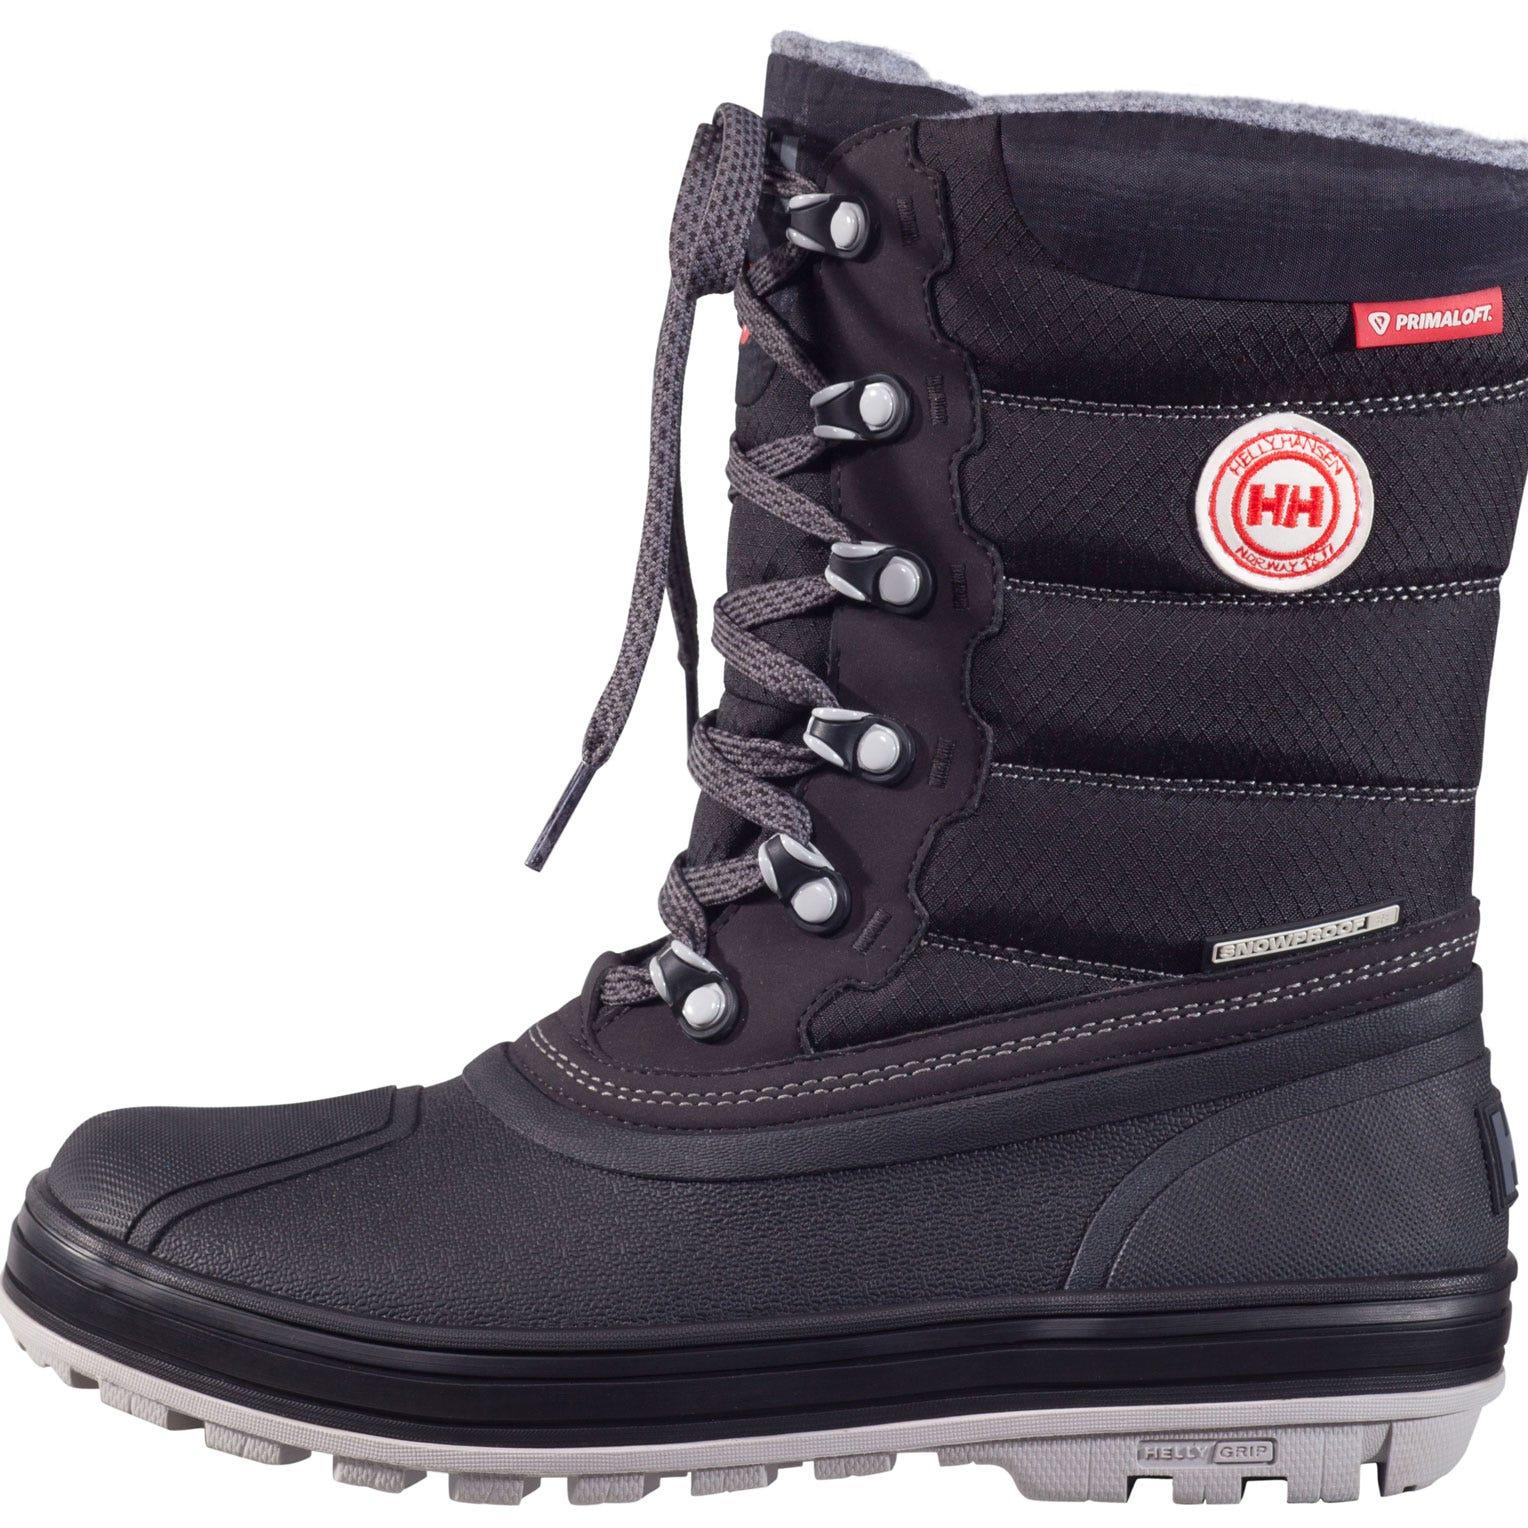 Helly Hansen W Tundra Cwb Womens Winter Boot Black 39.3/8